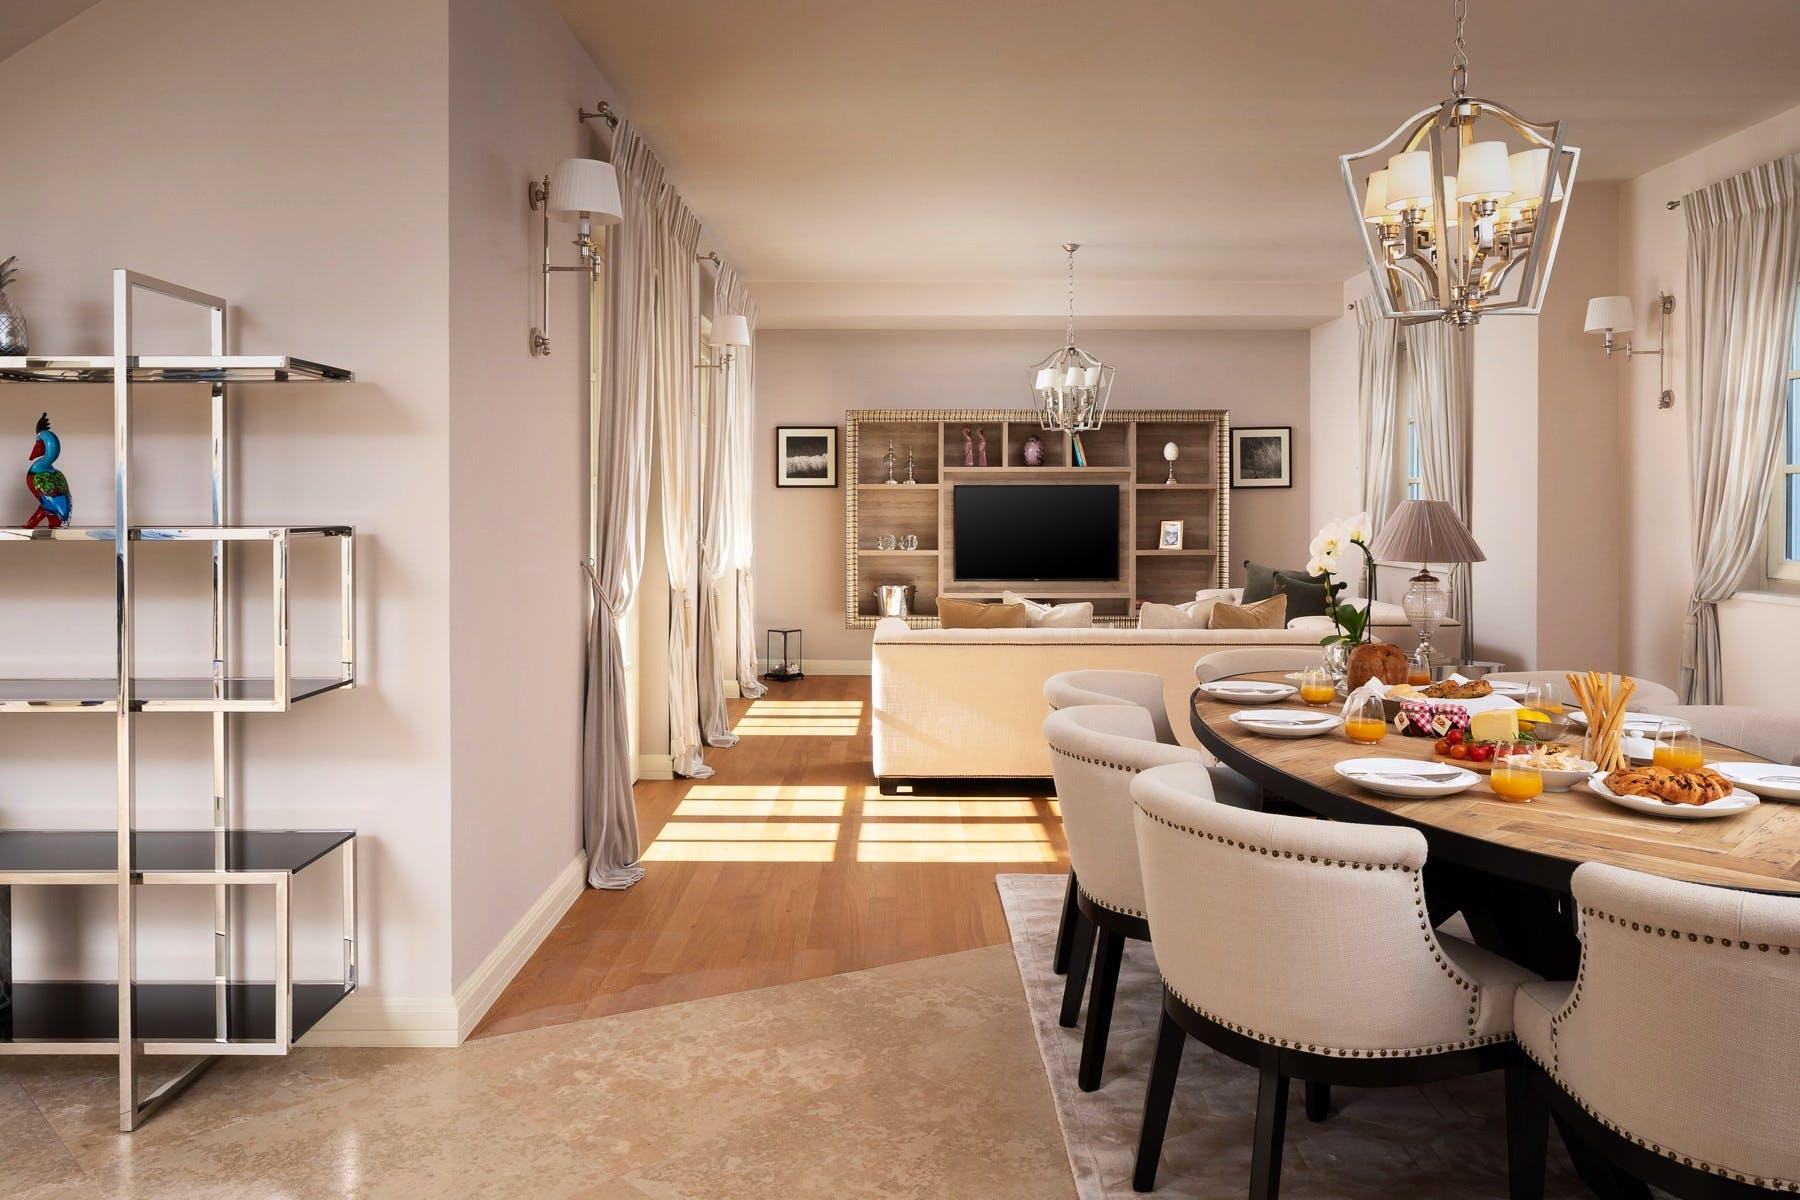 Living room area in neutral tones